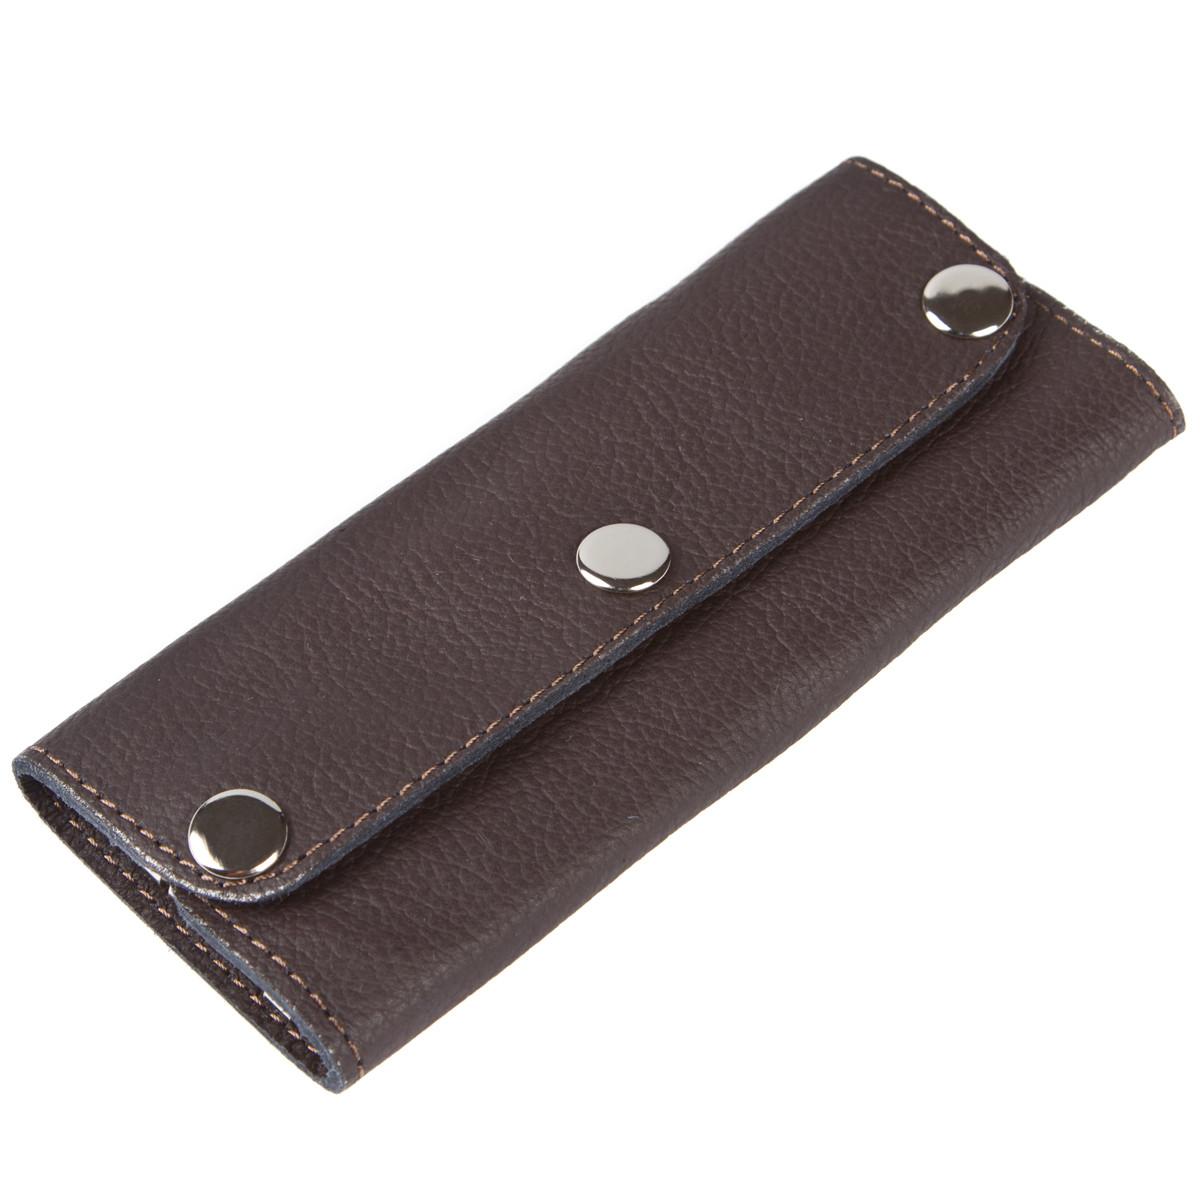 Ключница-портмоне кожанная на 6 ключей BagHouse  15х6,5х2,5    клКН15кор